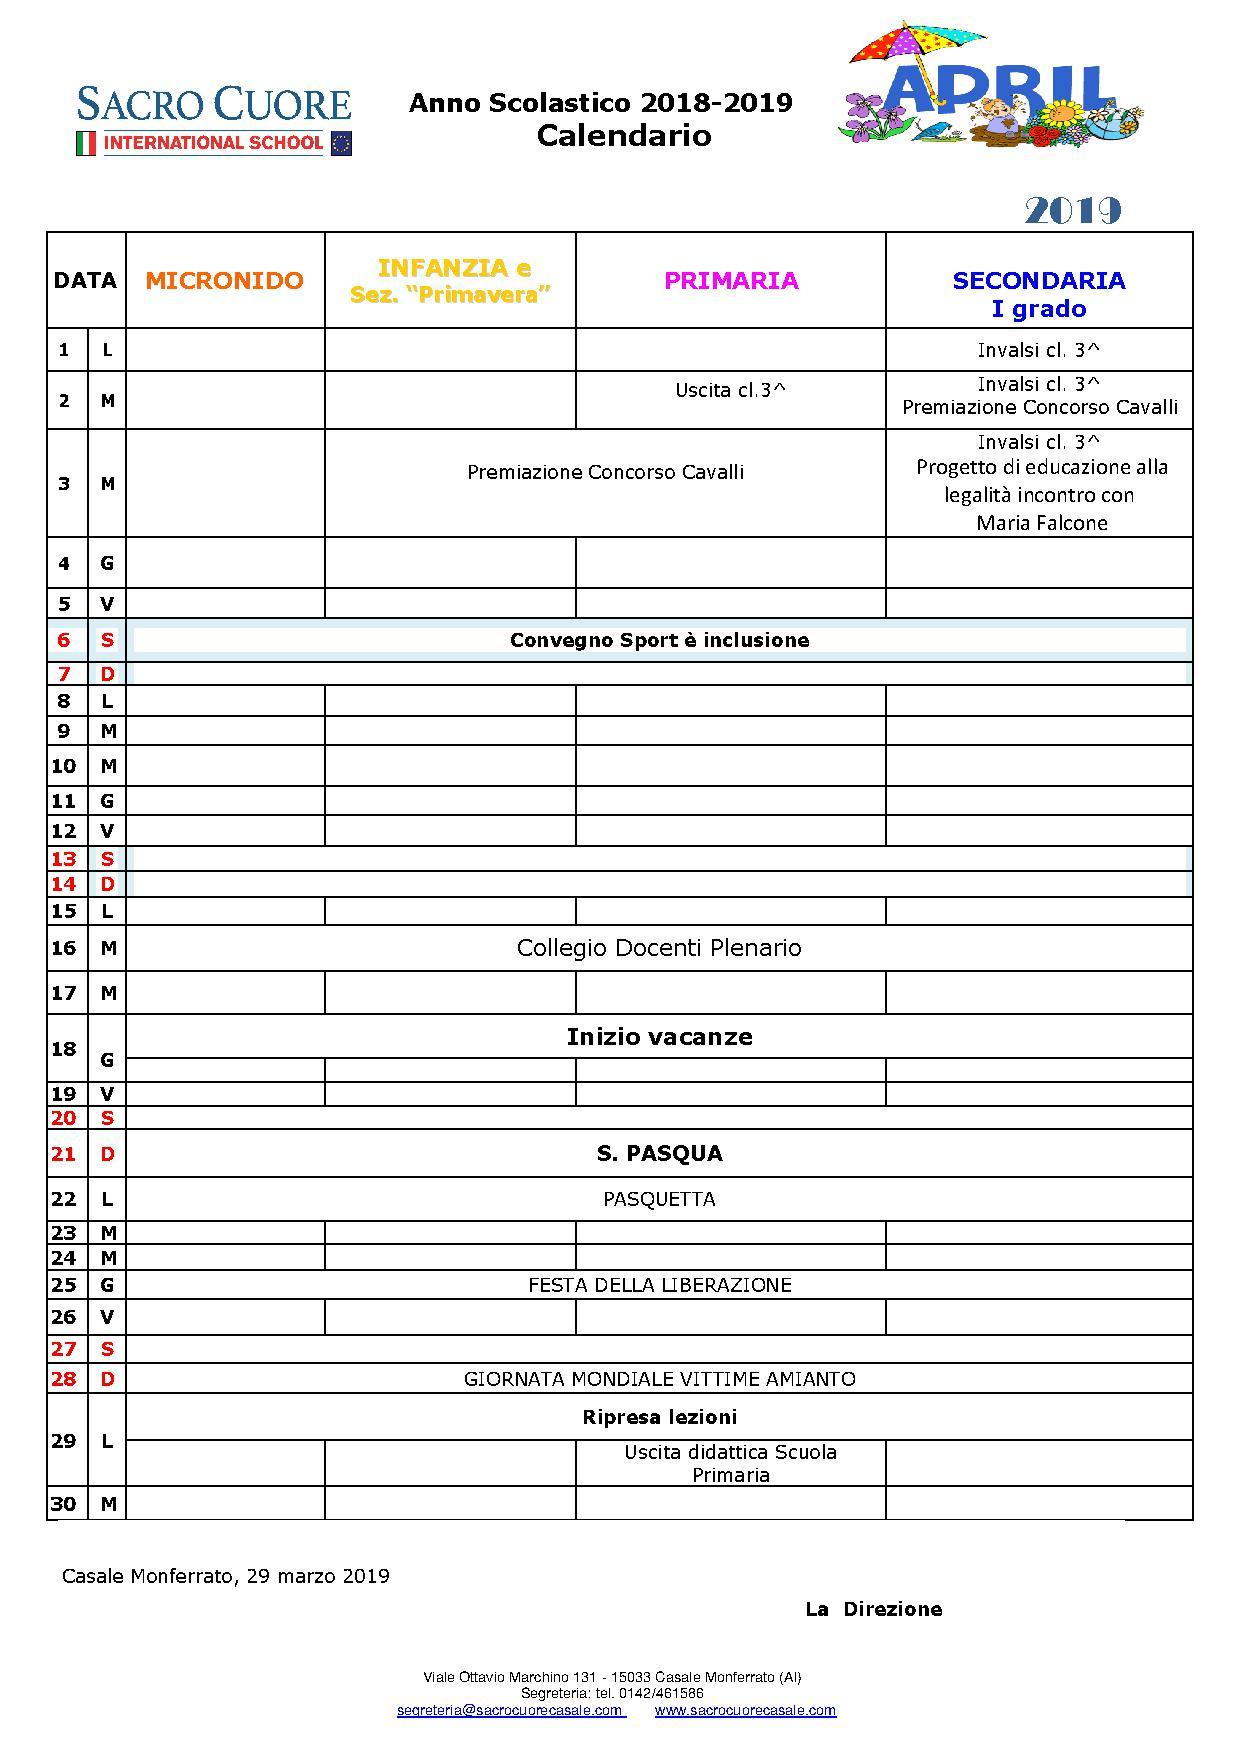 Marzo Calendario.Marzo 2019 Sacro Cuore Casale Monferrato